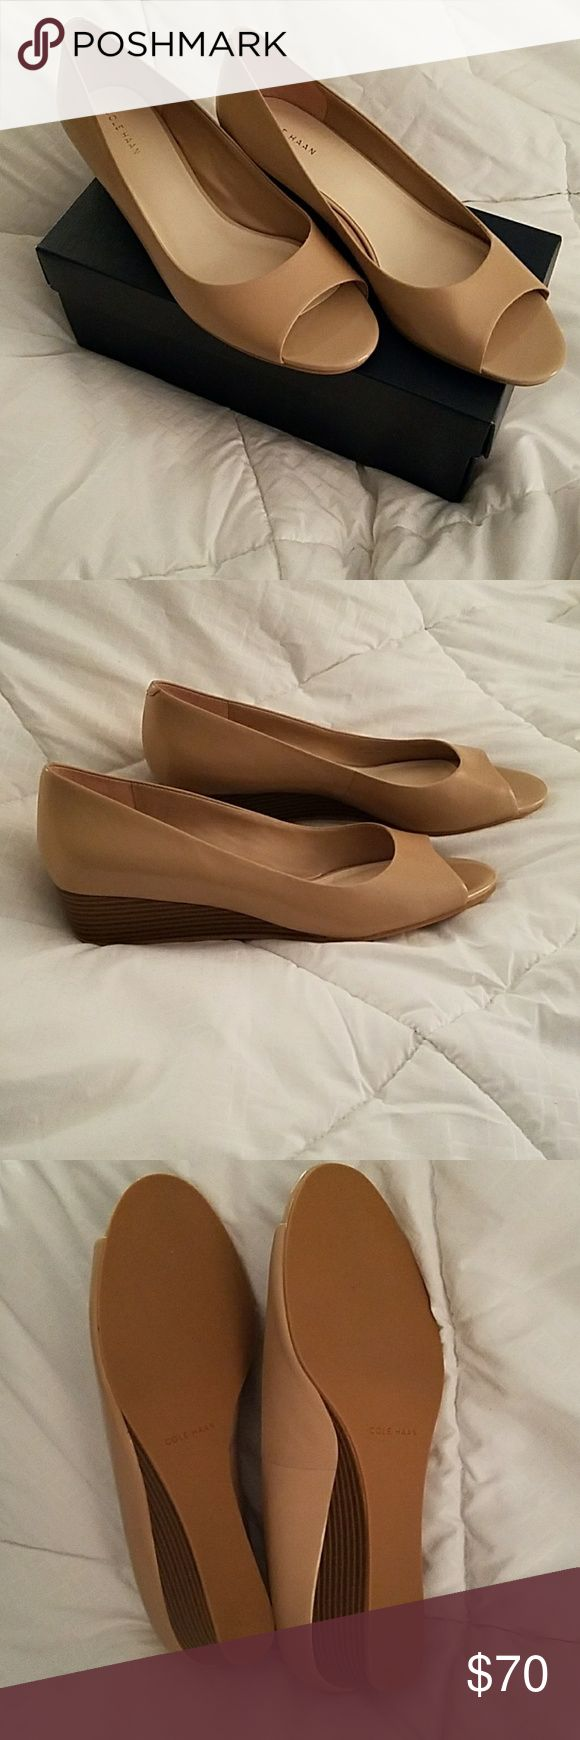 Cole Haan Tan Open Toe Wedges 👡Cole Haan Elsie Open Toe Wedge II in Maple Sugar 👡Worn twice, EUC, clean Cole Haan Shoes Wedges